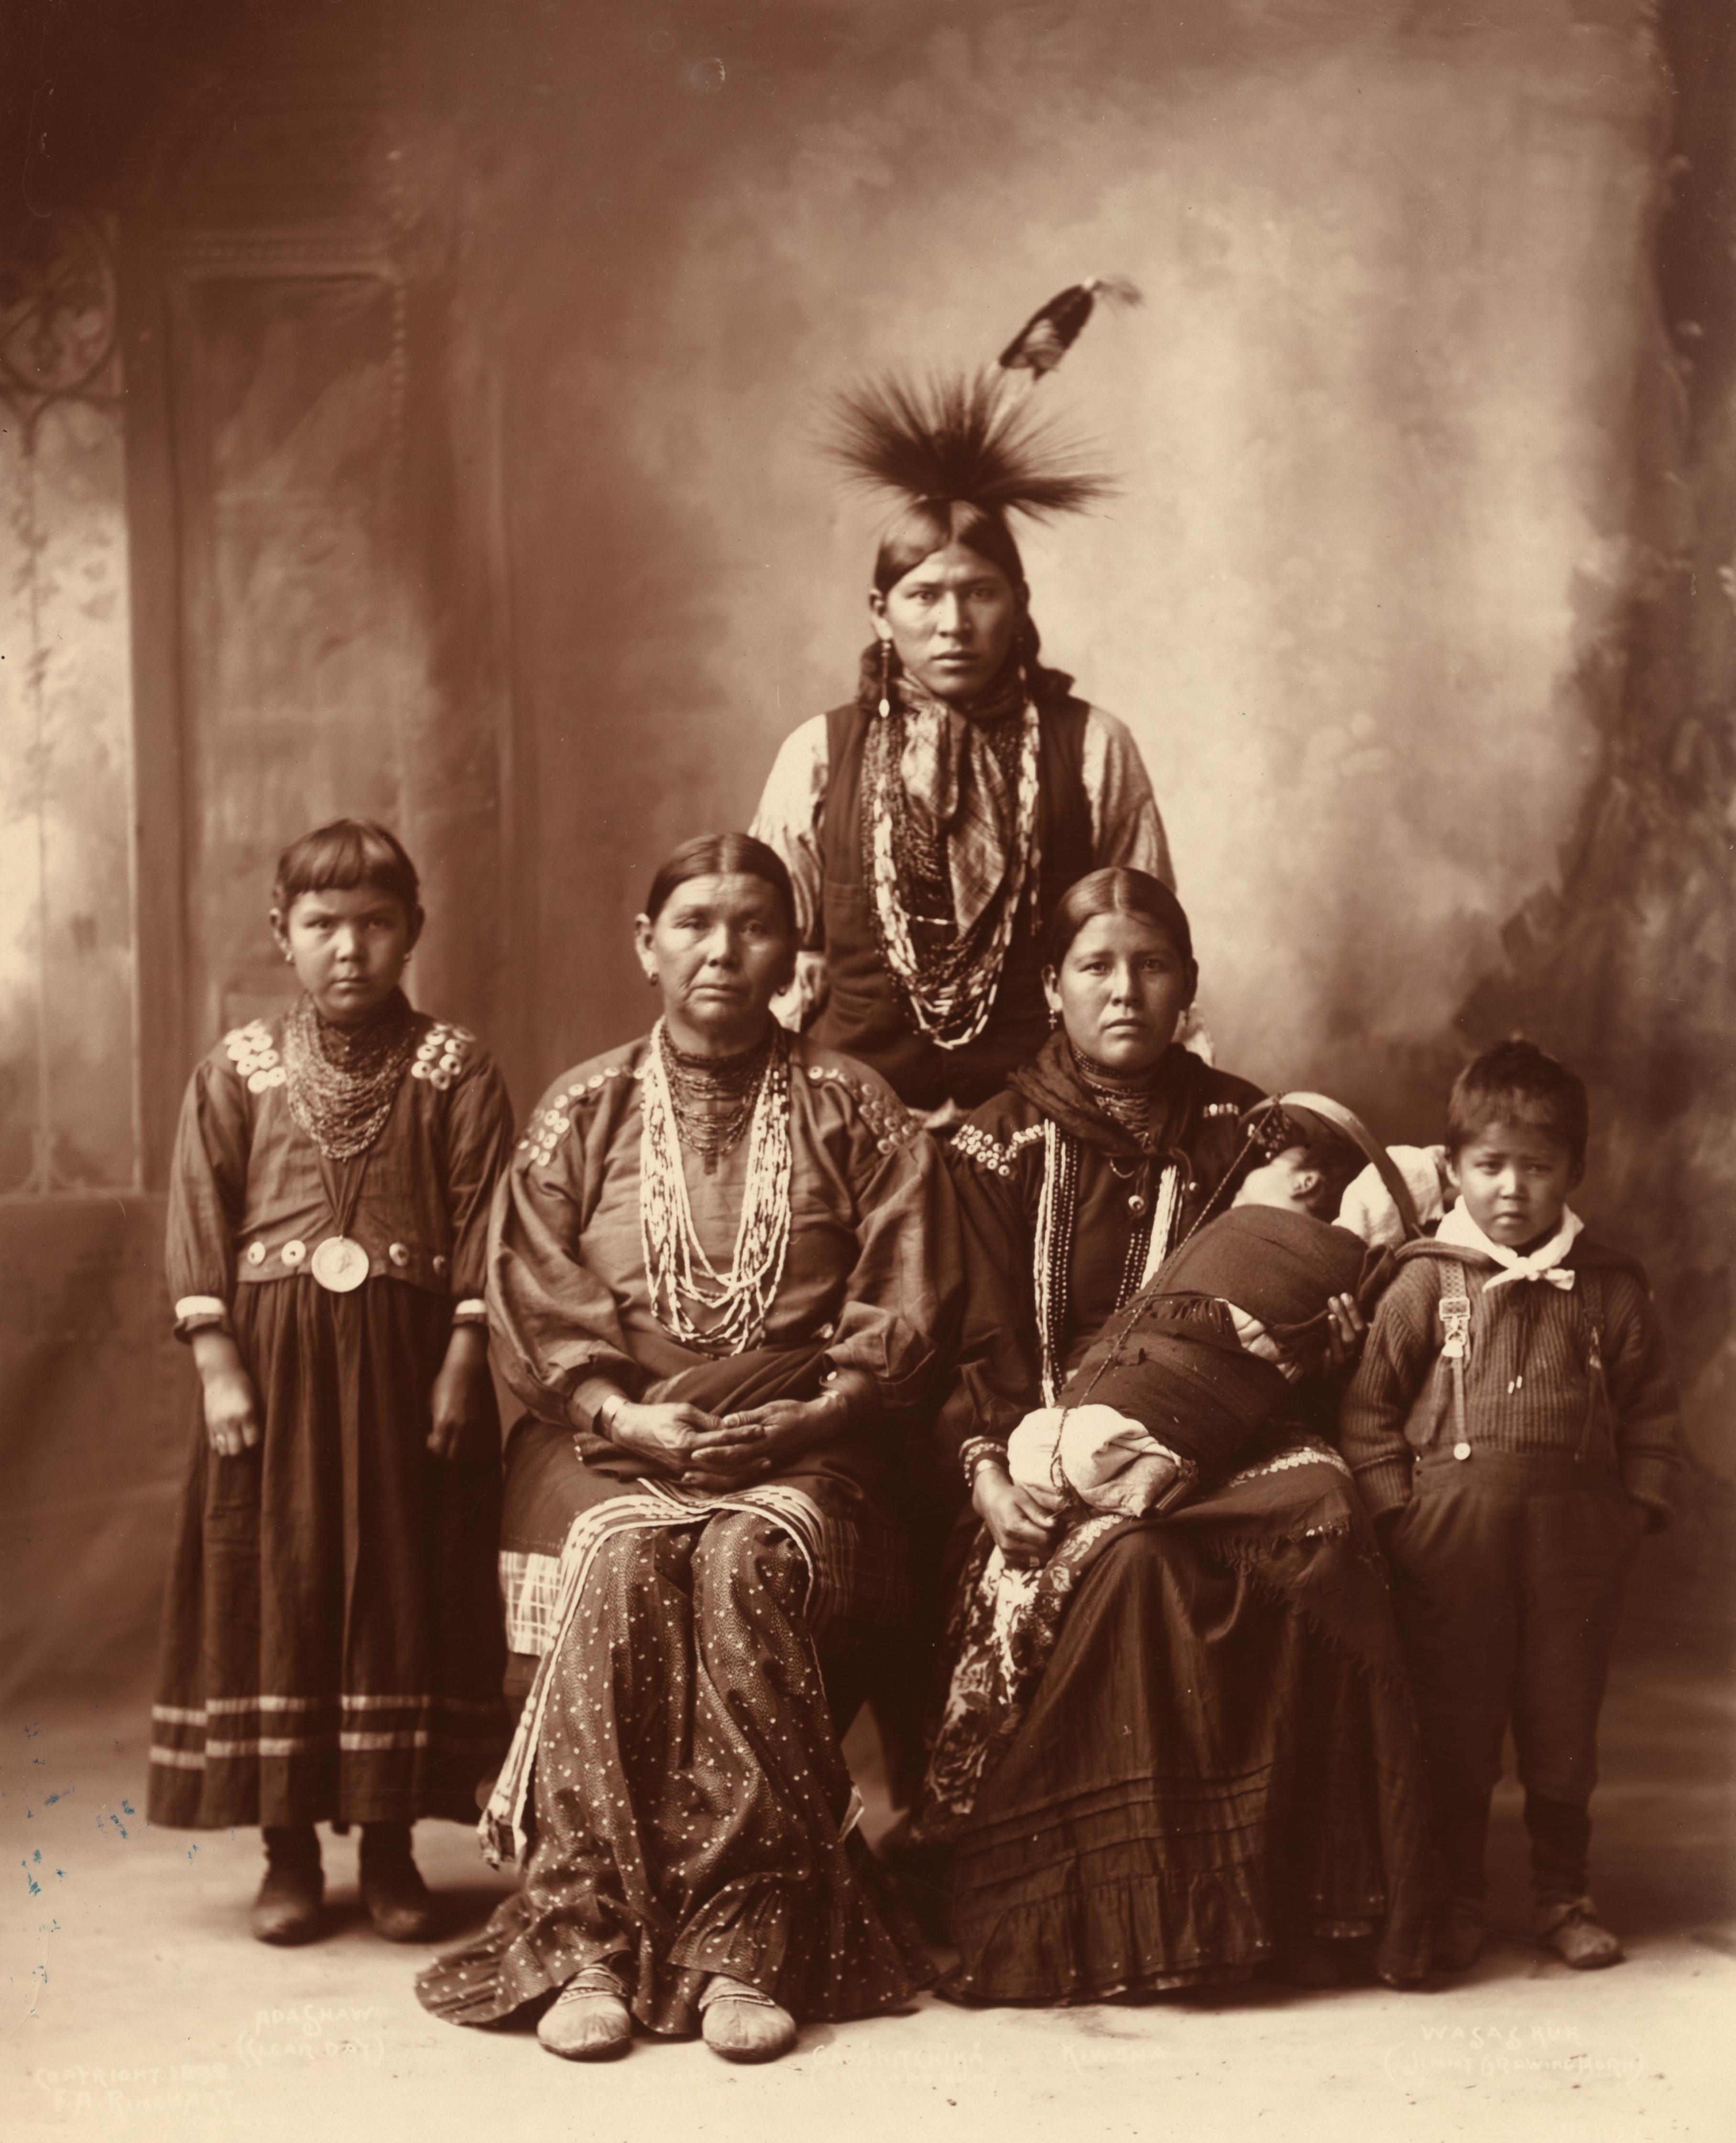 File:Sauk Indian family by Frank Rinehart 1899.jpg - Wikipedia